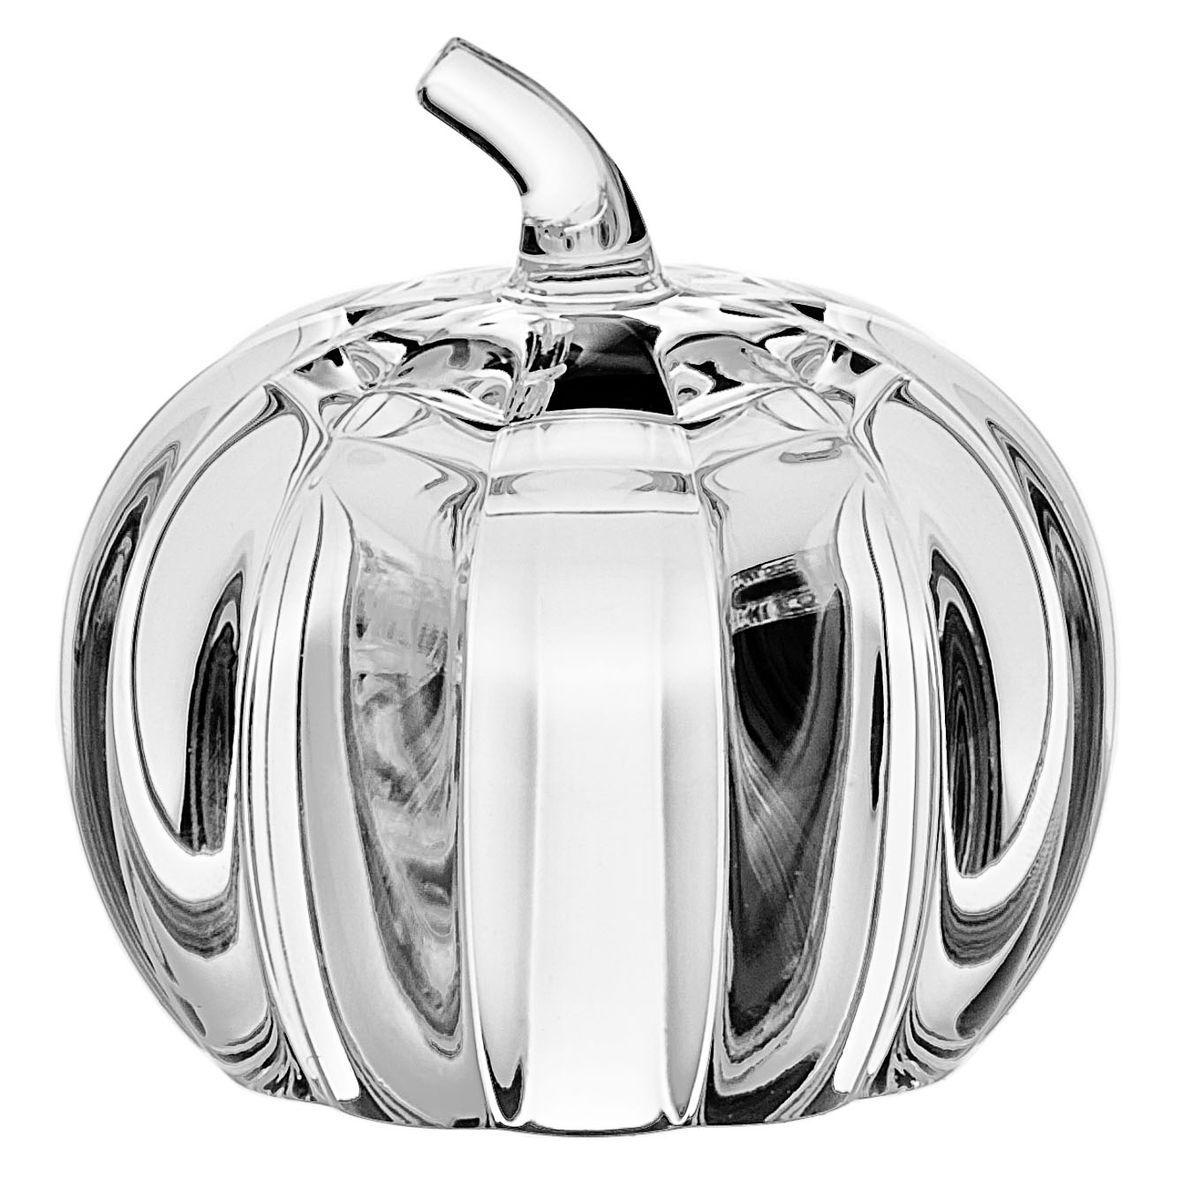 Набор для специй Crystal Bohemia Тыква, 2 предмета набор для кофе crystal bohemia mokko 4 предмета